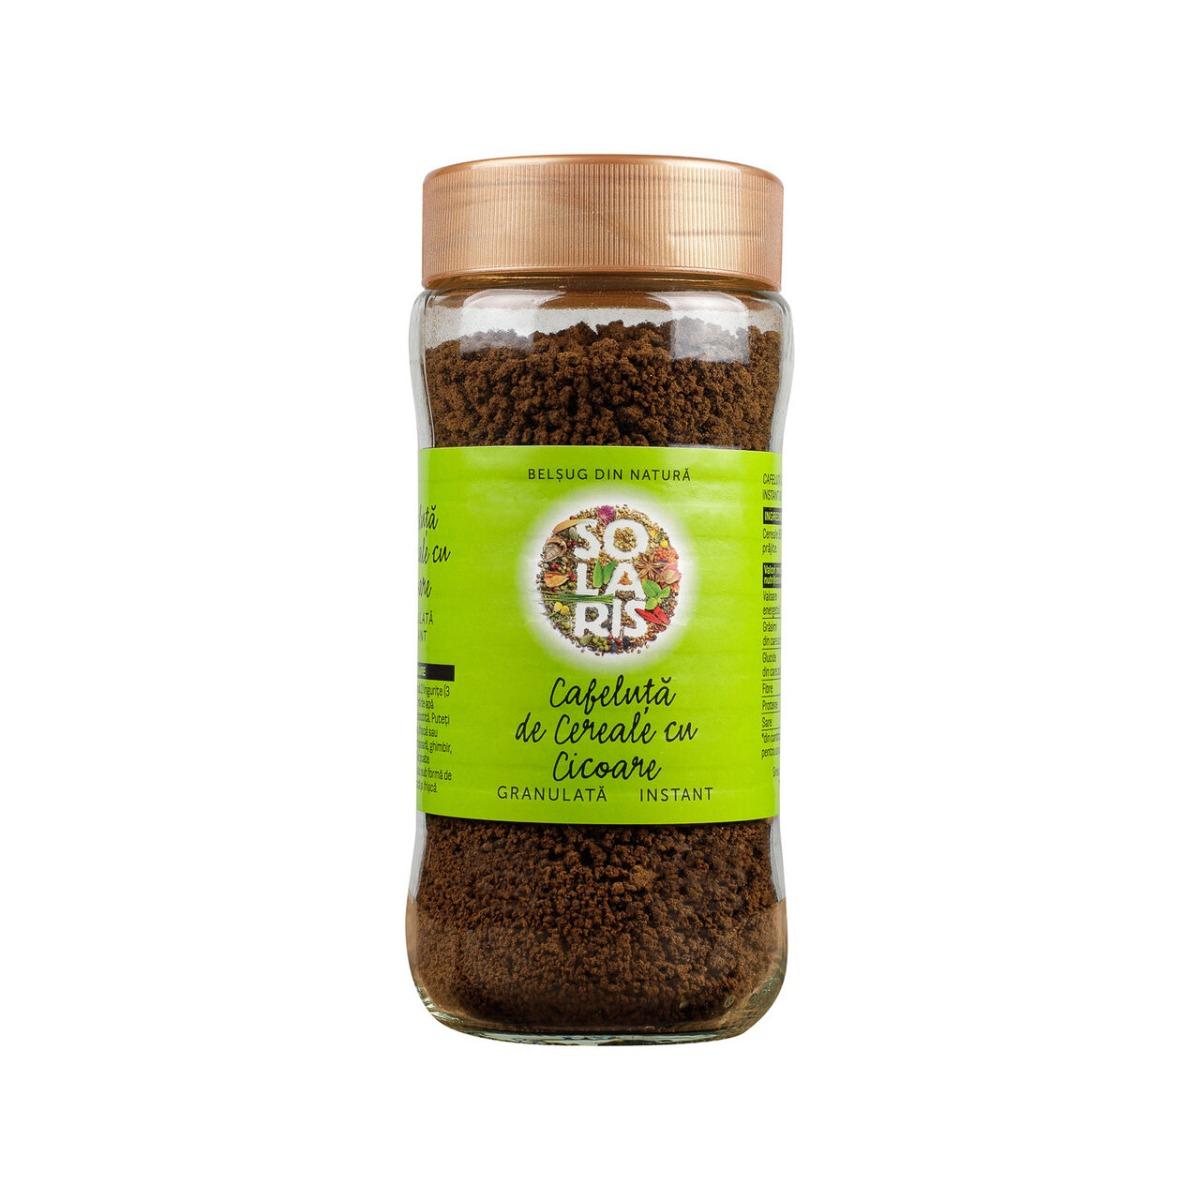 Cafeluta de cereale cu cicoare granulata, 100g, Solaris drmax.ro